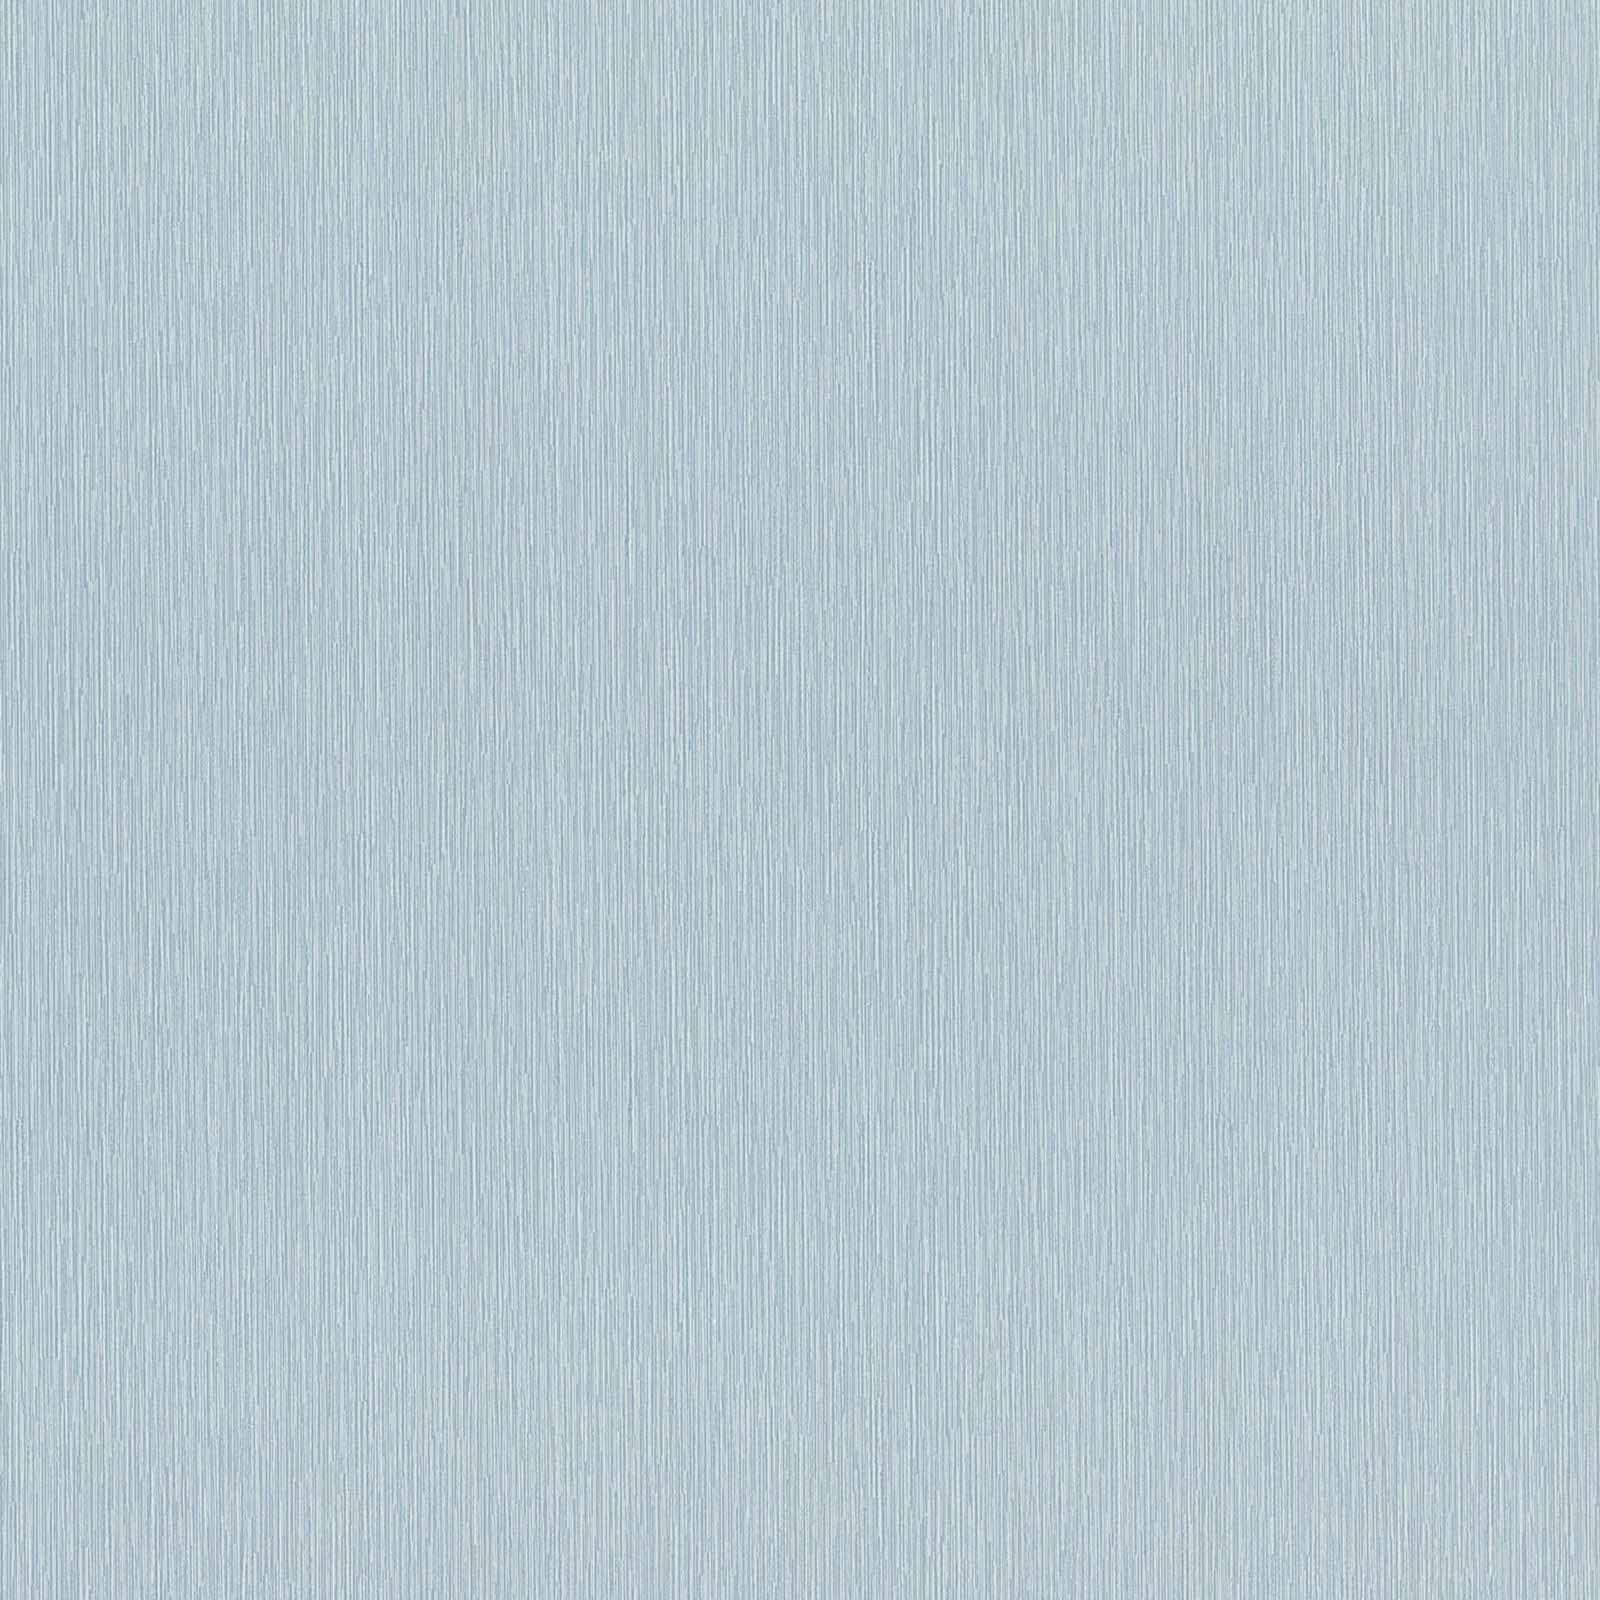 Vliestapete uni blau mit struktur 10 meter for Roller tapeten